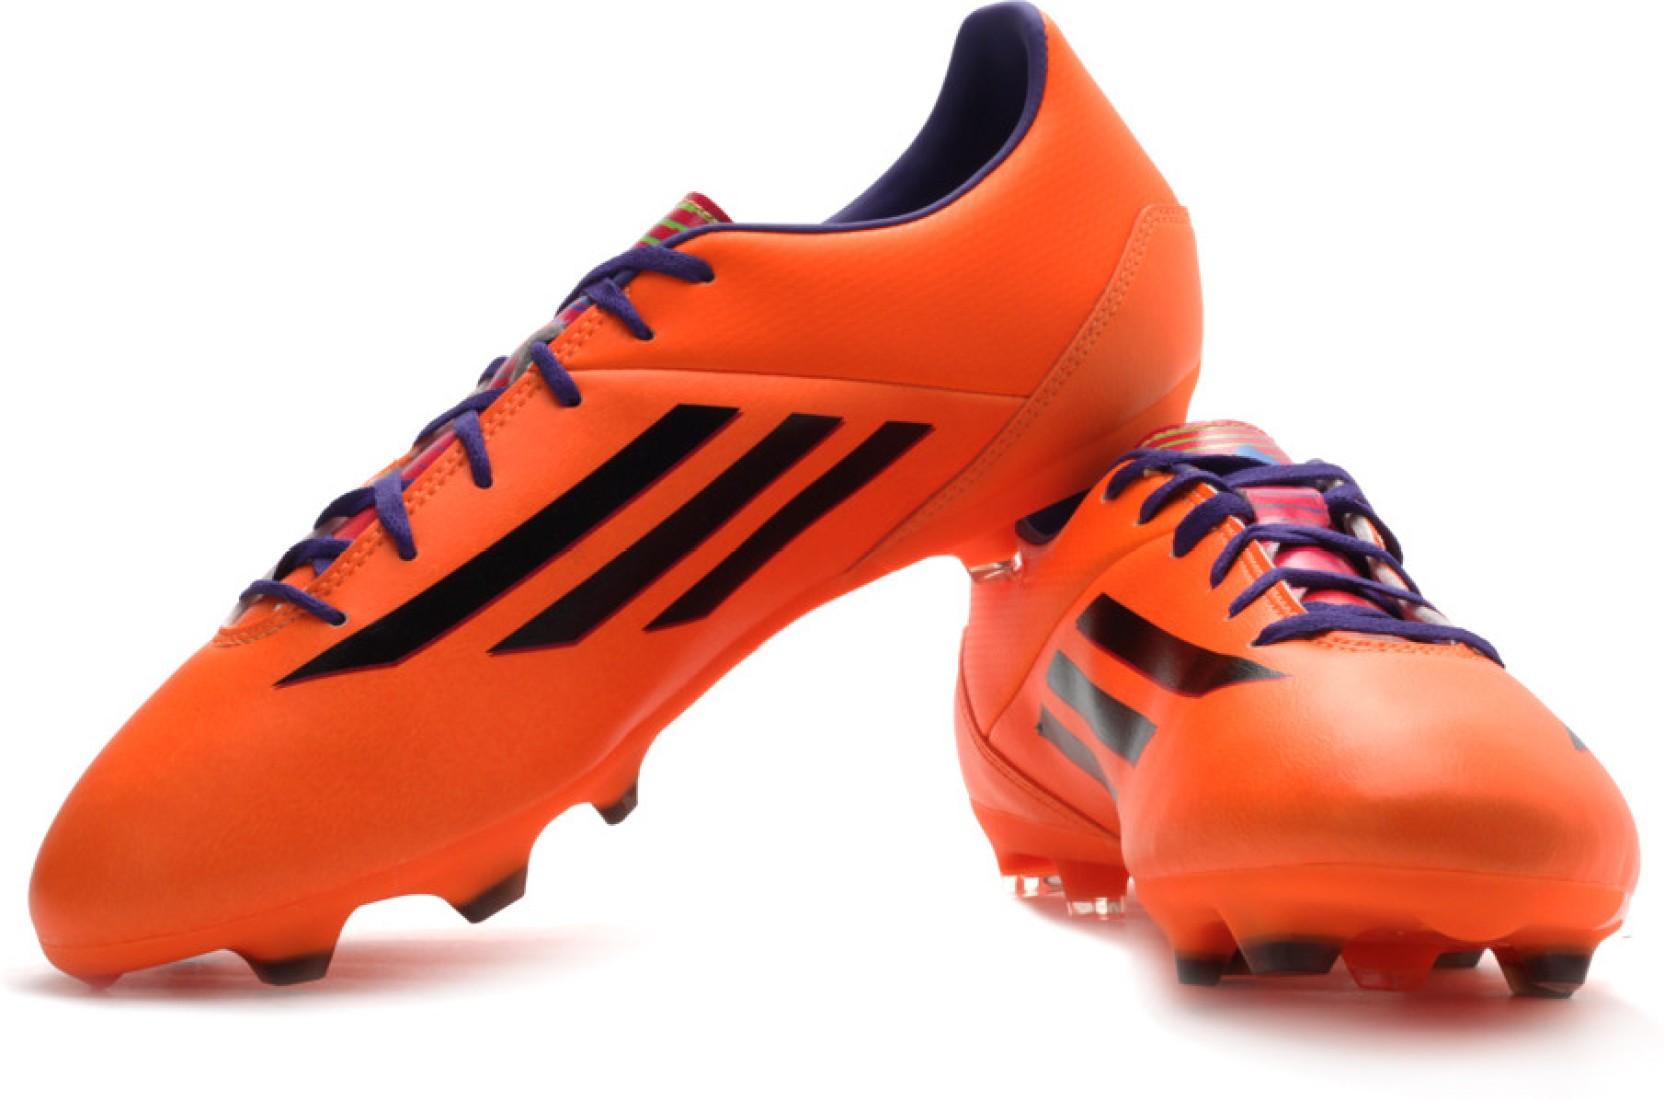 ... amazon c8812 248da Adidas F10 Trx Fg Football Studs For Men Buy Orange  Color Futsal Original ... 8b5f883efe3ff